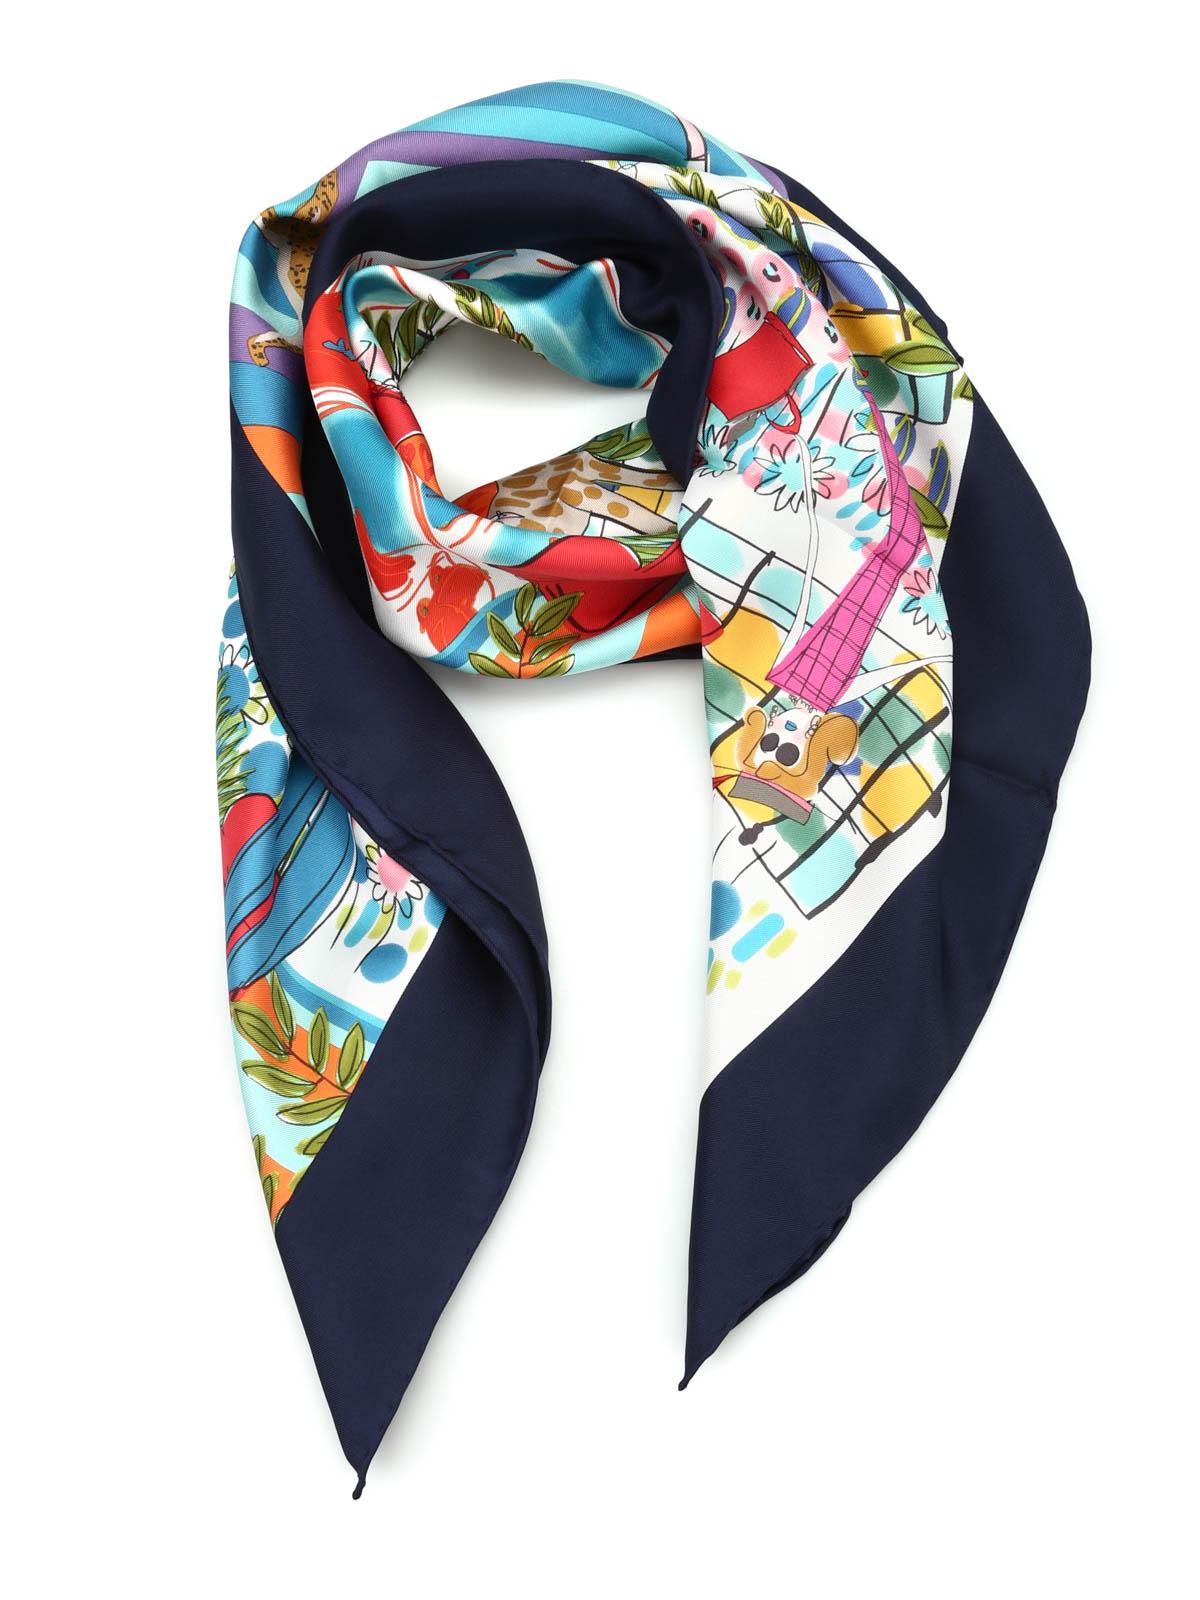 Patchwork silk foulard by Salvatore Ferragamo - scarves - iKRIX